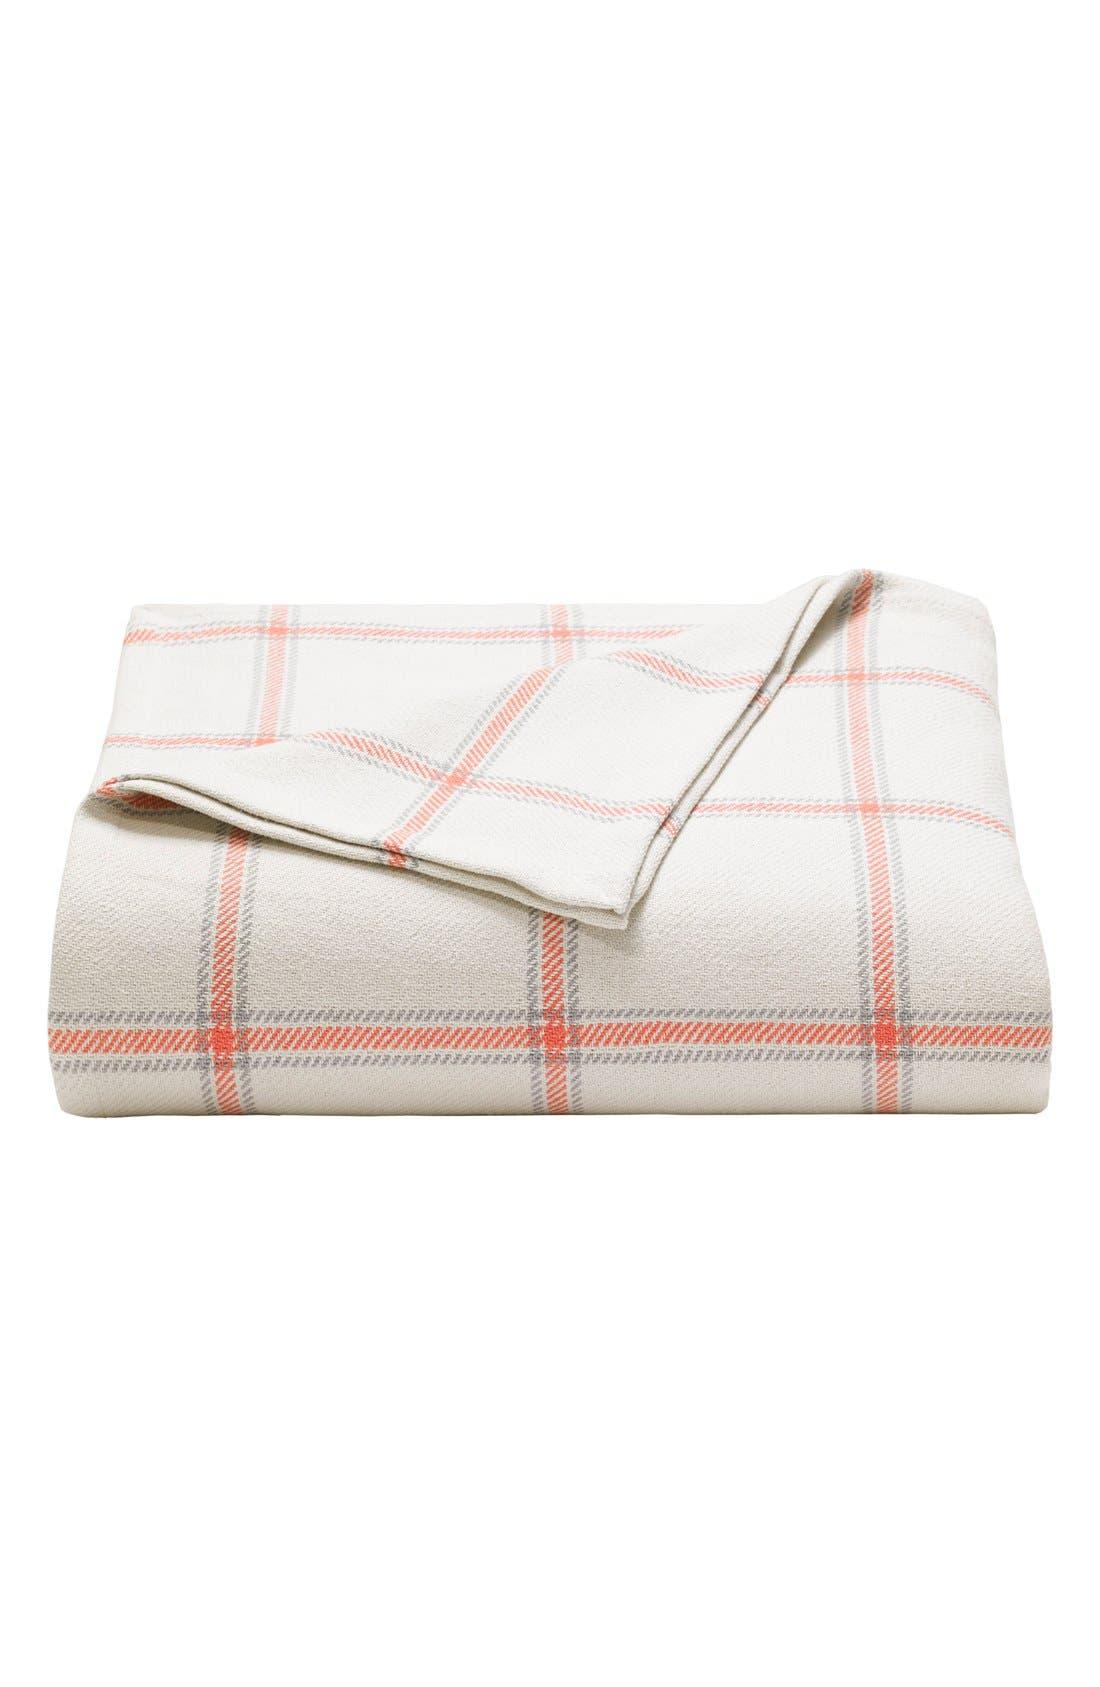 'Halstead' Windowpane Plaid Blanket,                         Main,                         color,